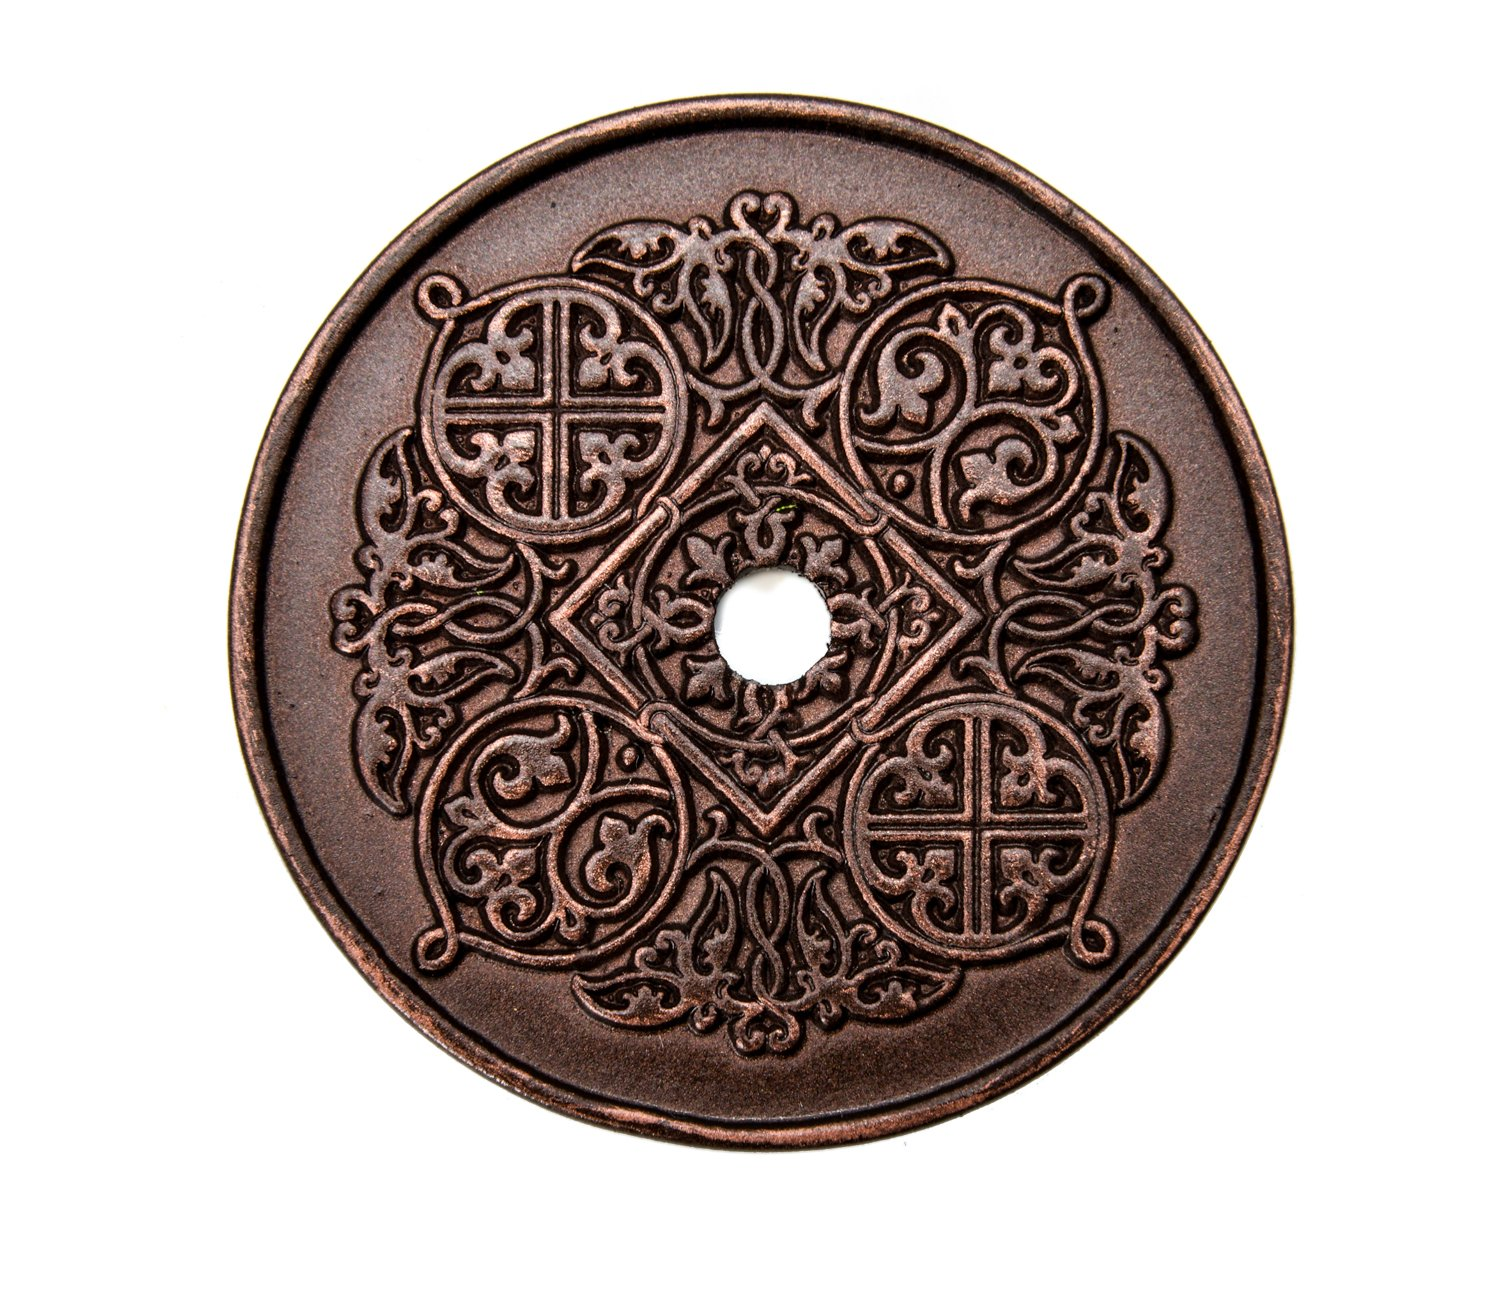 Carpe Diem Hardware Carpe Diem 307-22 Millennium Large round escutcheon Oil Rubbed Bronze Oil Rubbed Bronze